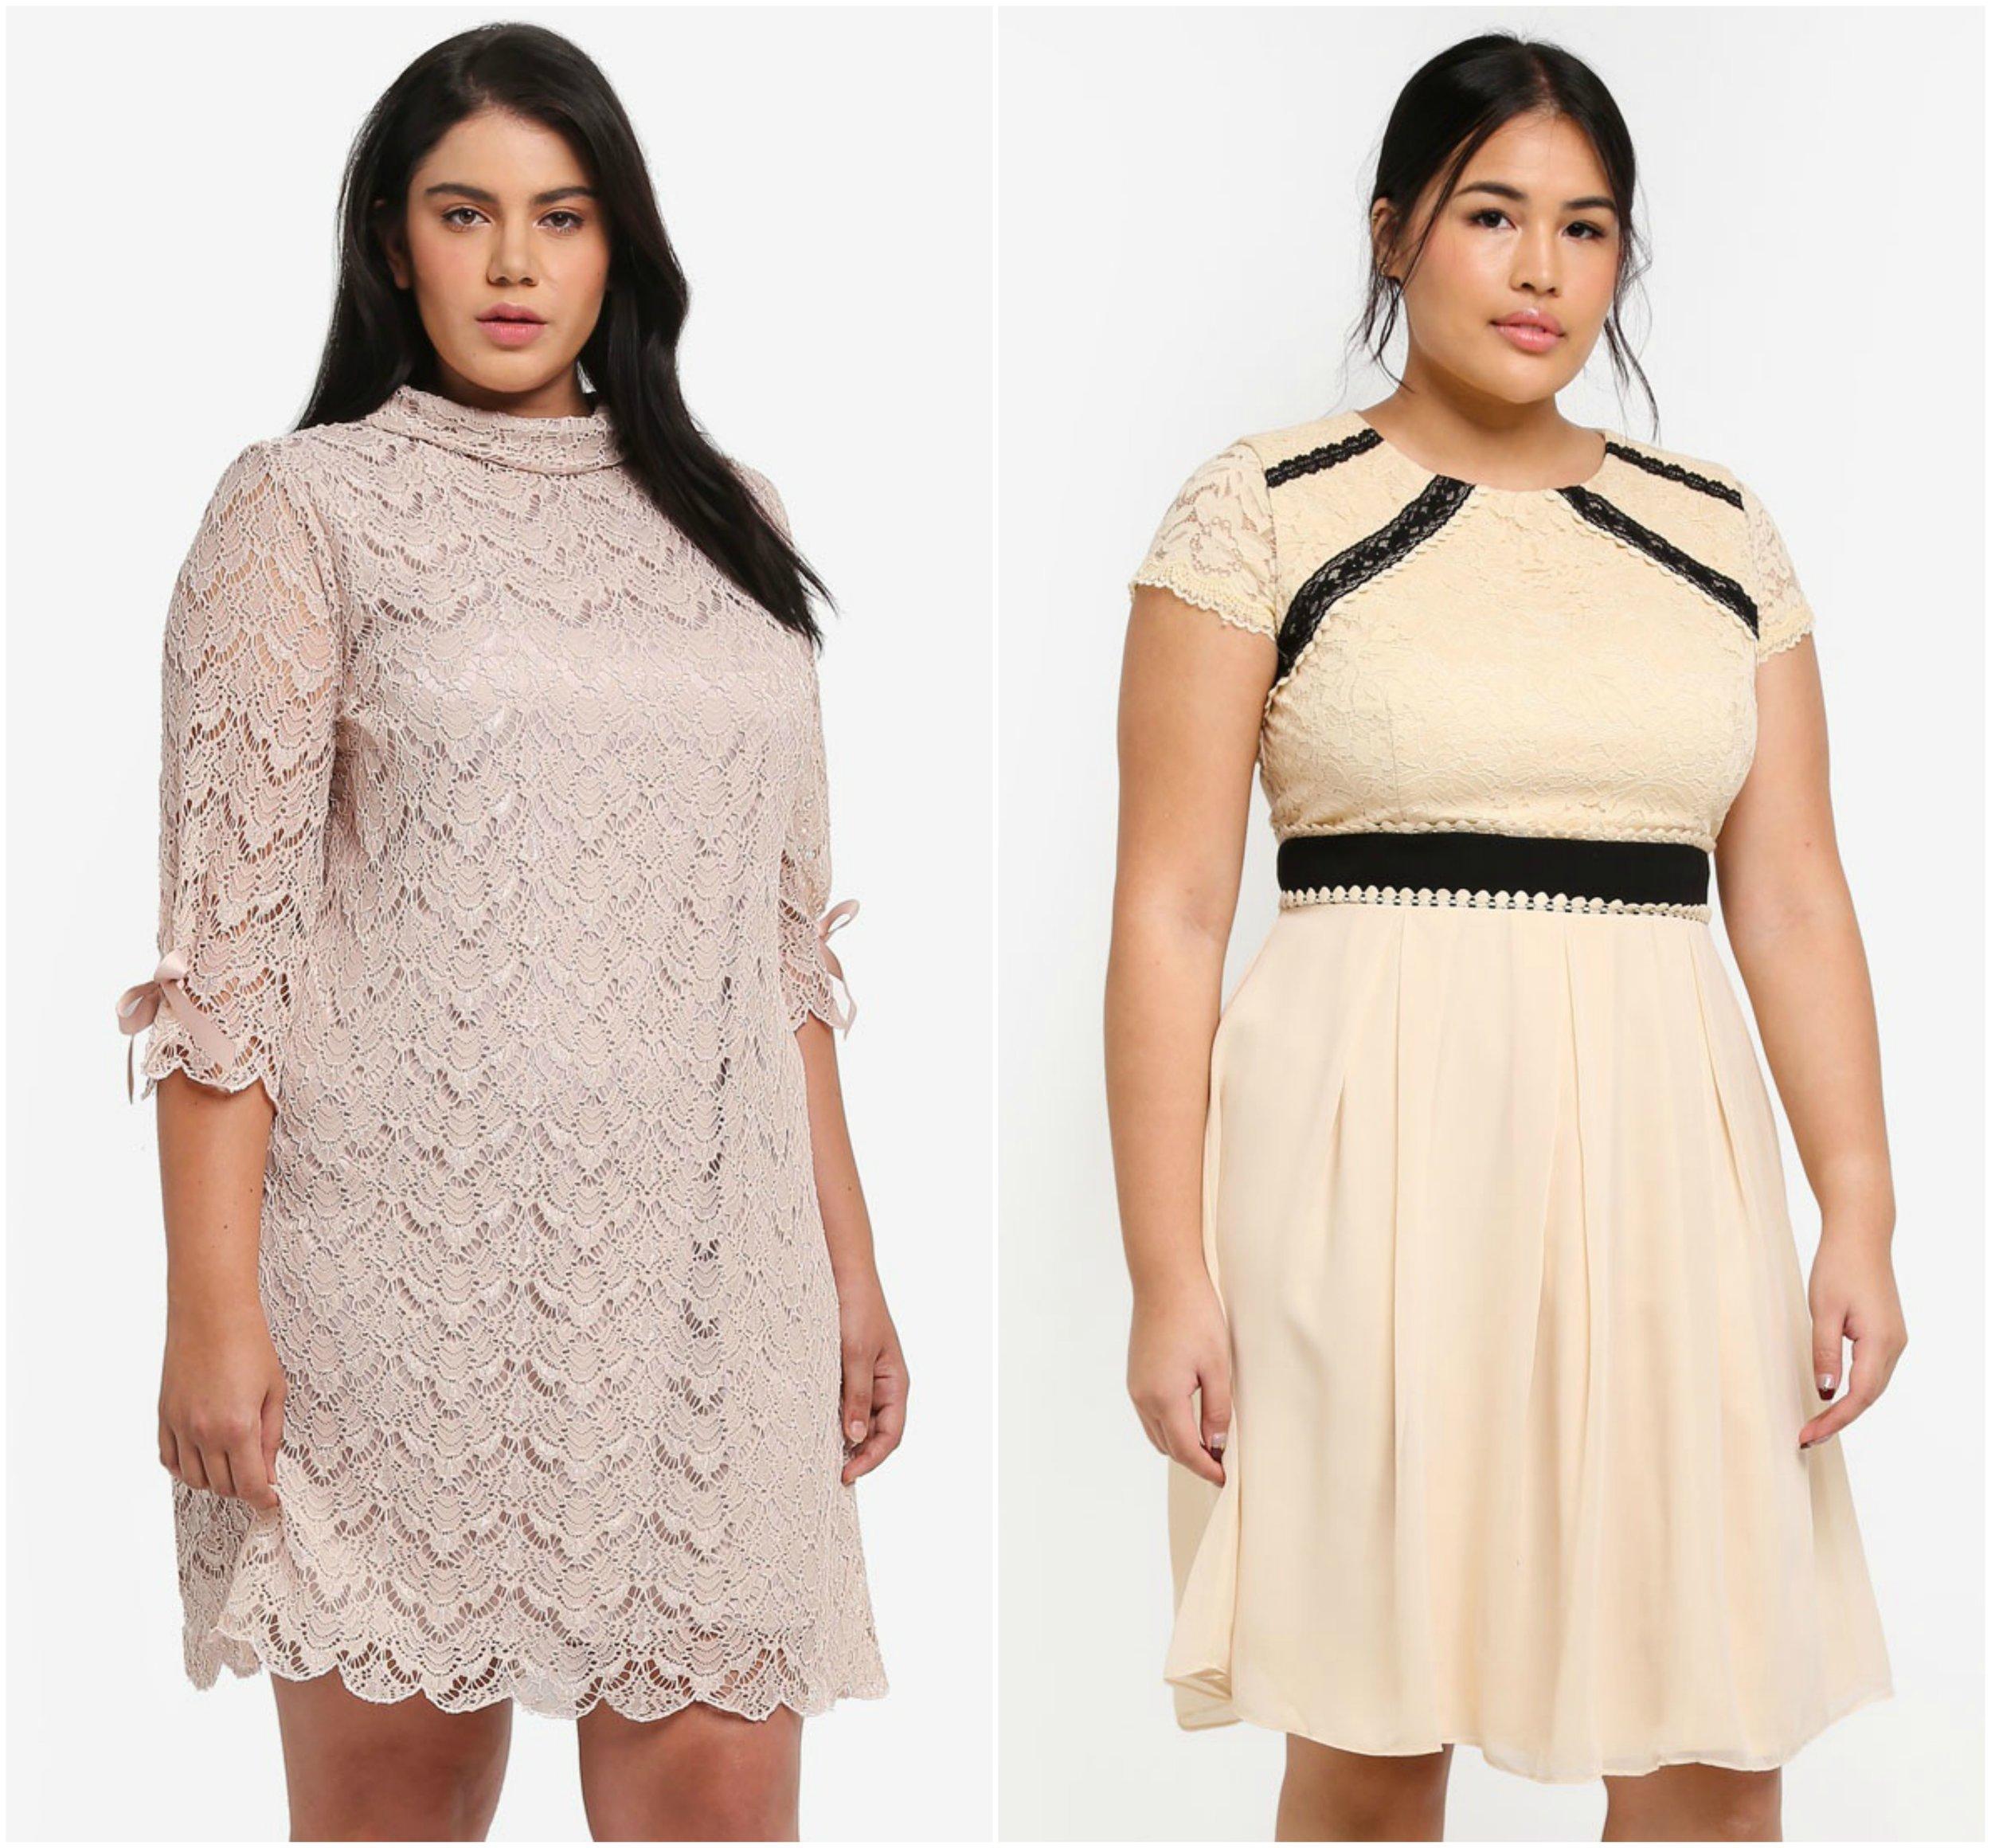 1.  ELVI Plus Size 3/4 Sleeve Lace Dress  , 2.  LITTLE MISTRESS Plus Size Cream Prom Dress